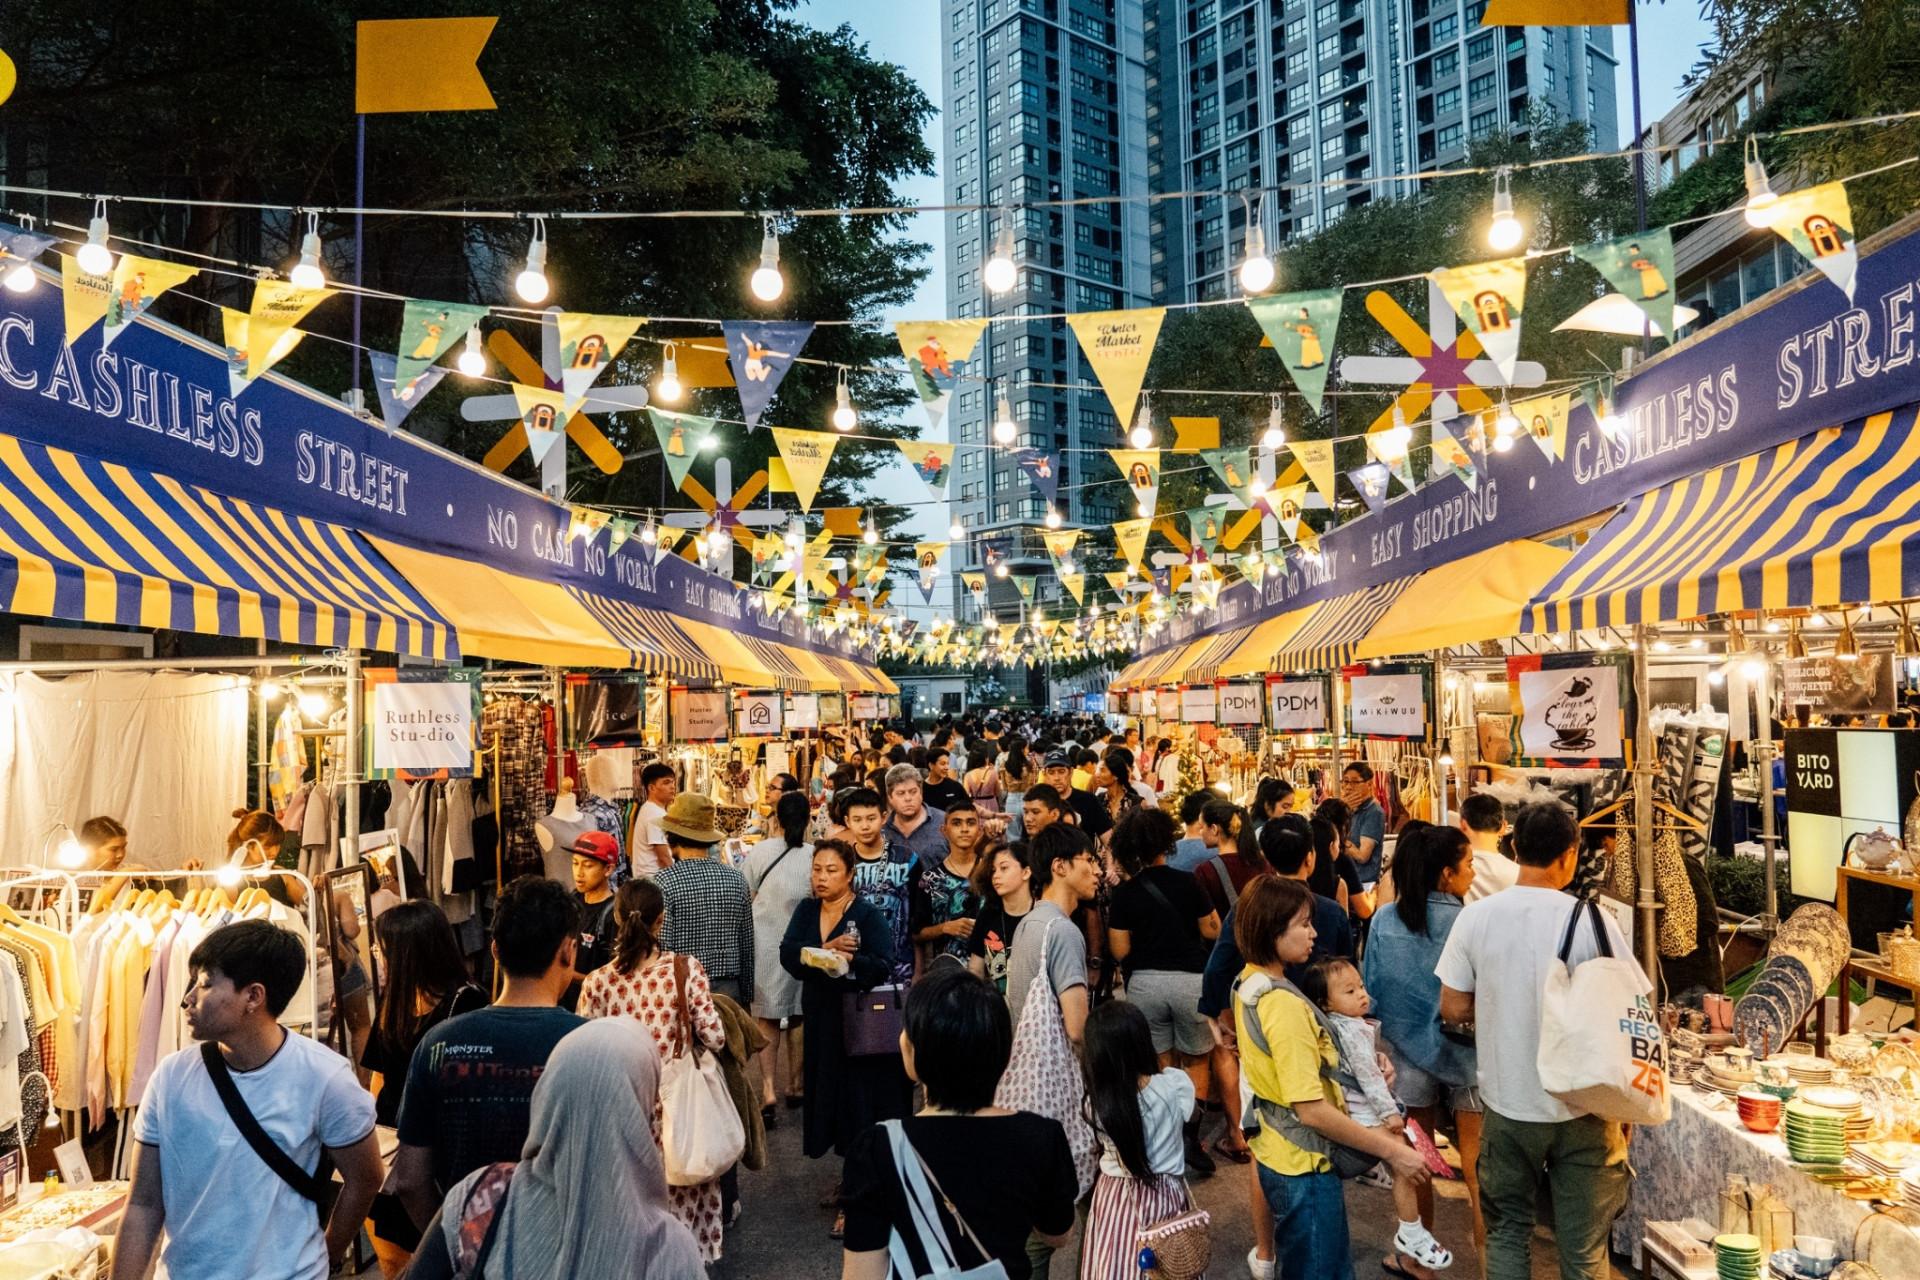 Winter Market Fest SCB Cashless Zone